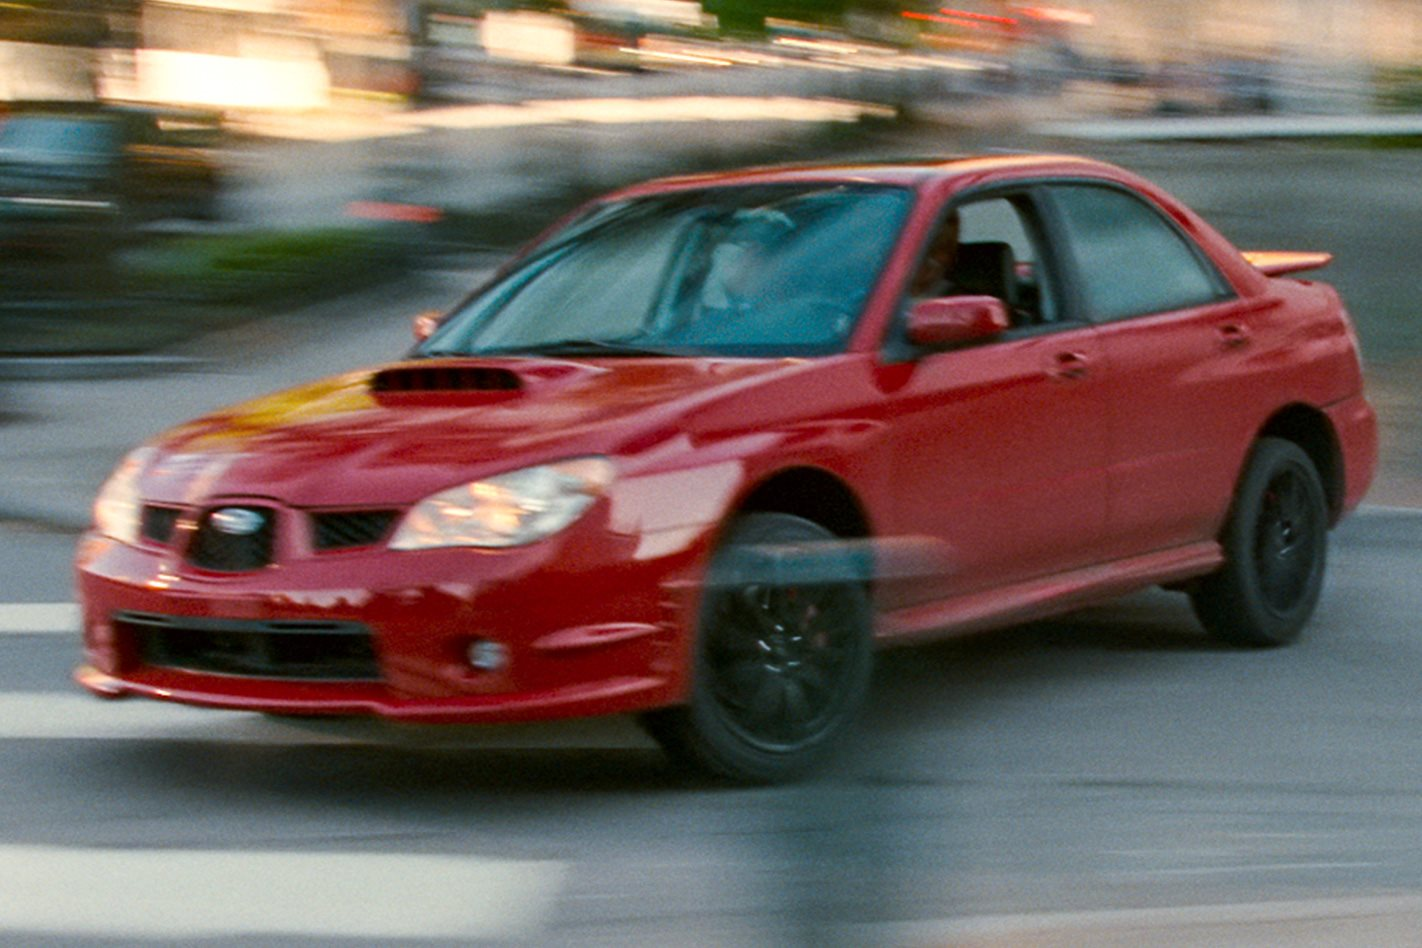 Baby Drivers Subaru WRX getaway scene